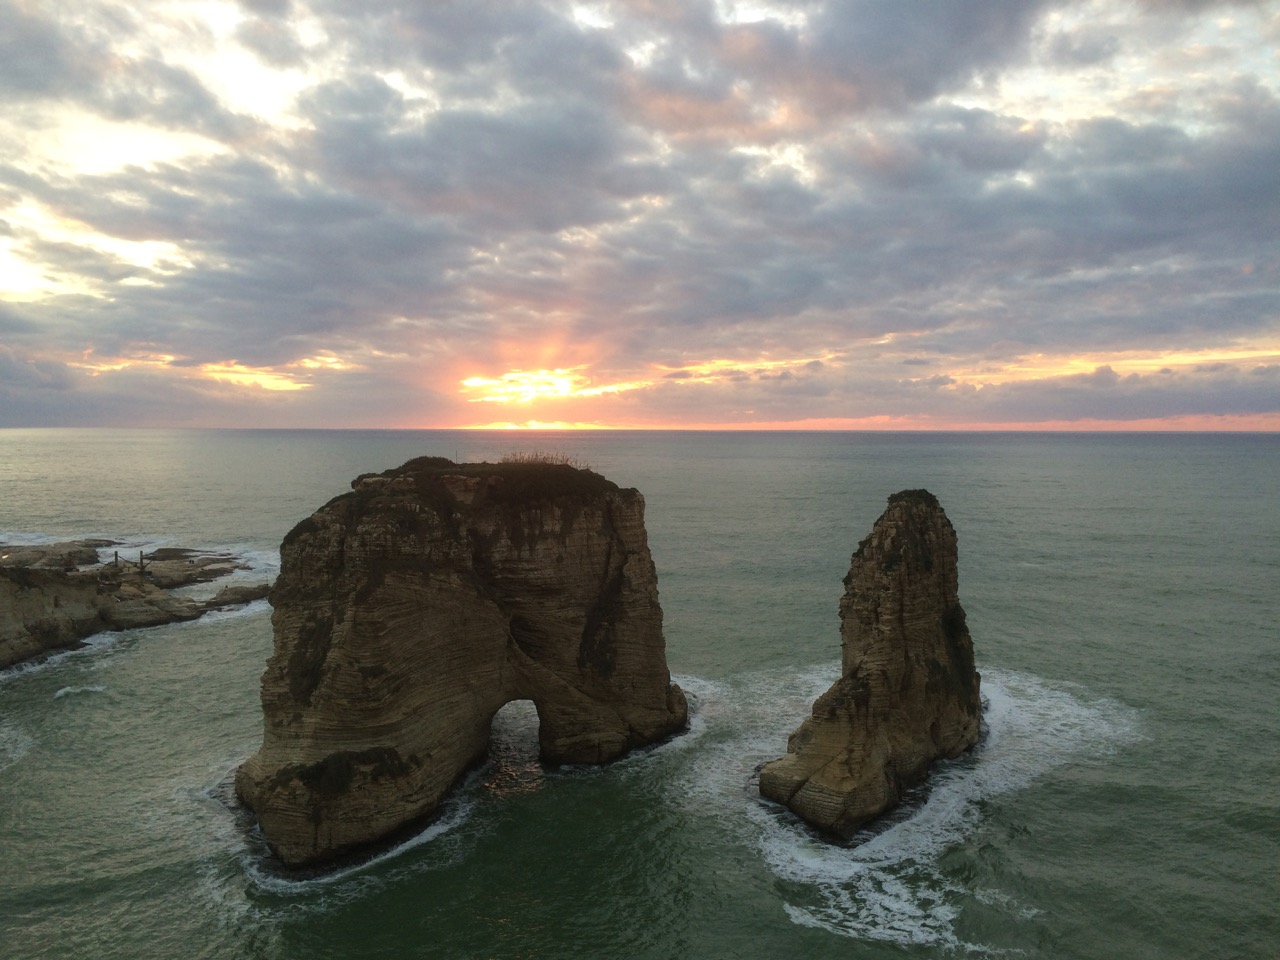 Sunset over Pigeon Rocks